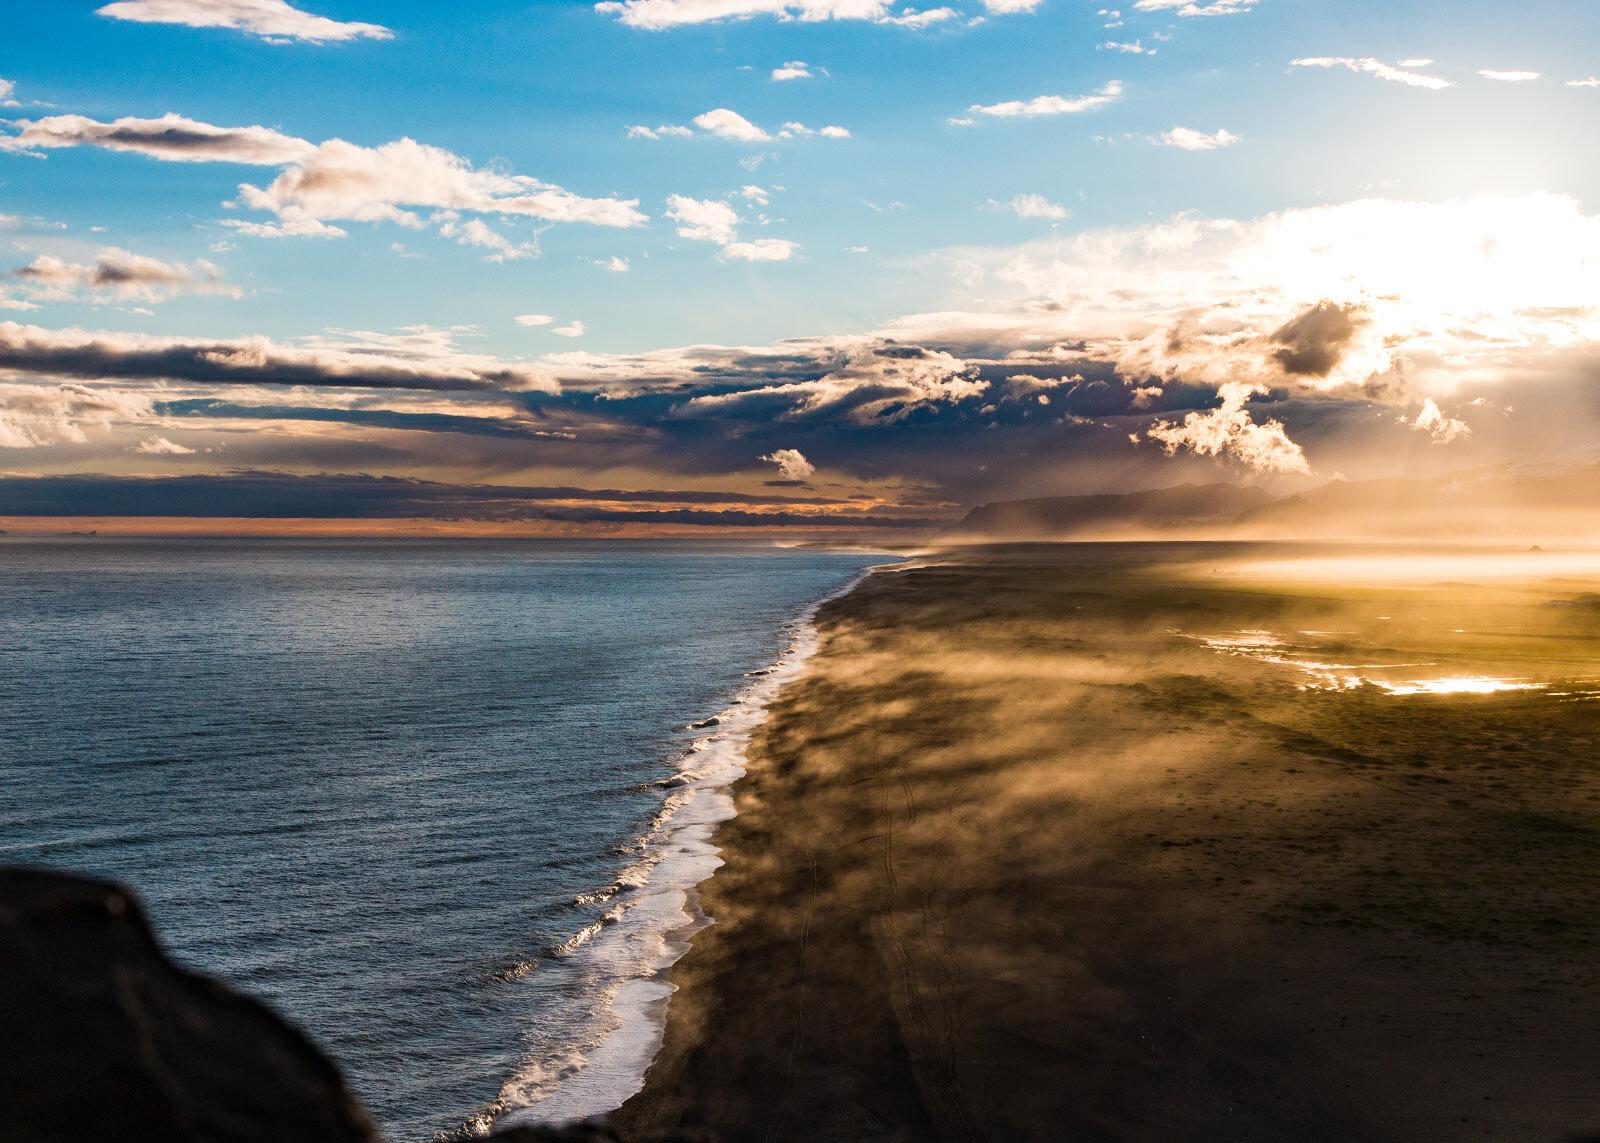 Dyrhólaey sunset at the Black Beach